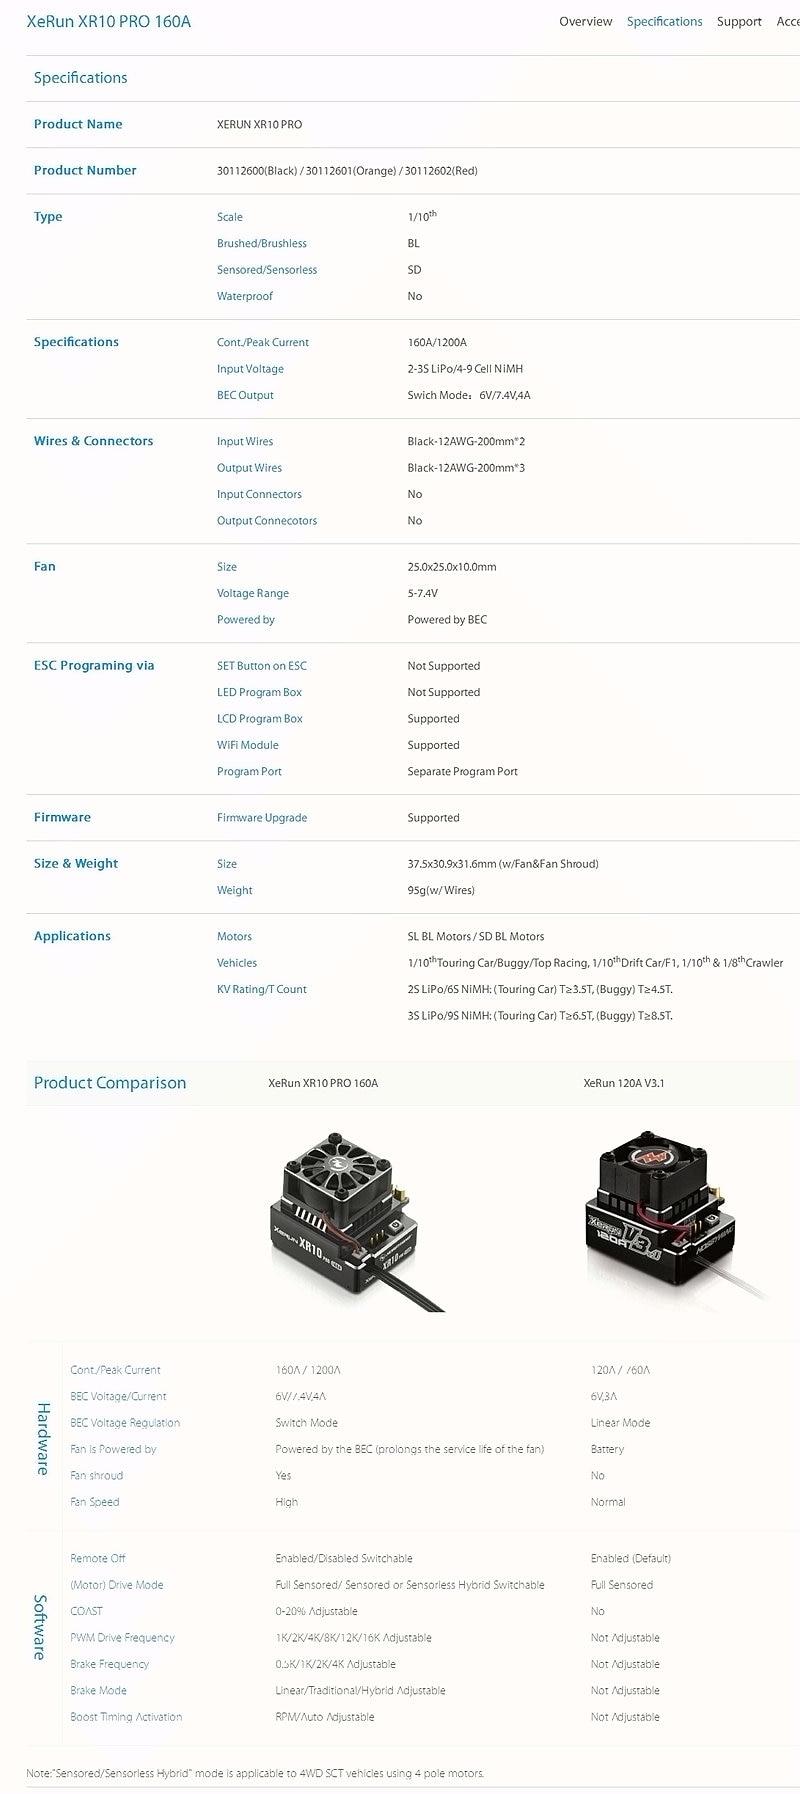 XeRun XR10 PRO 160A_Car Systems_HOBBYWING _ Welcom1_